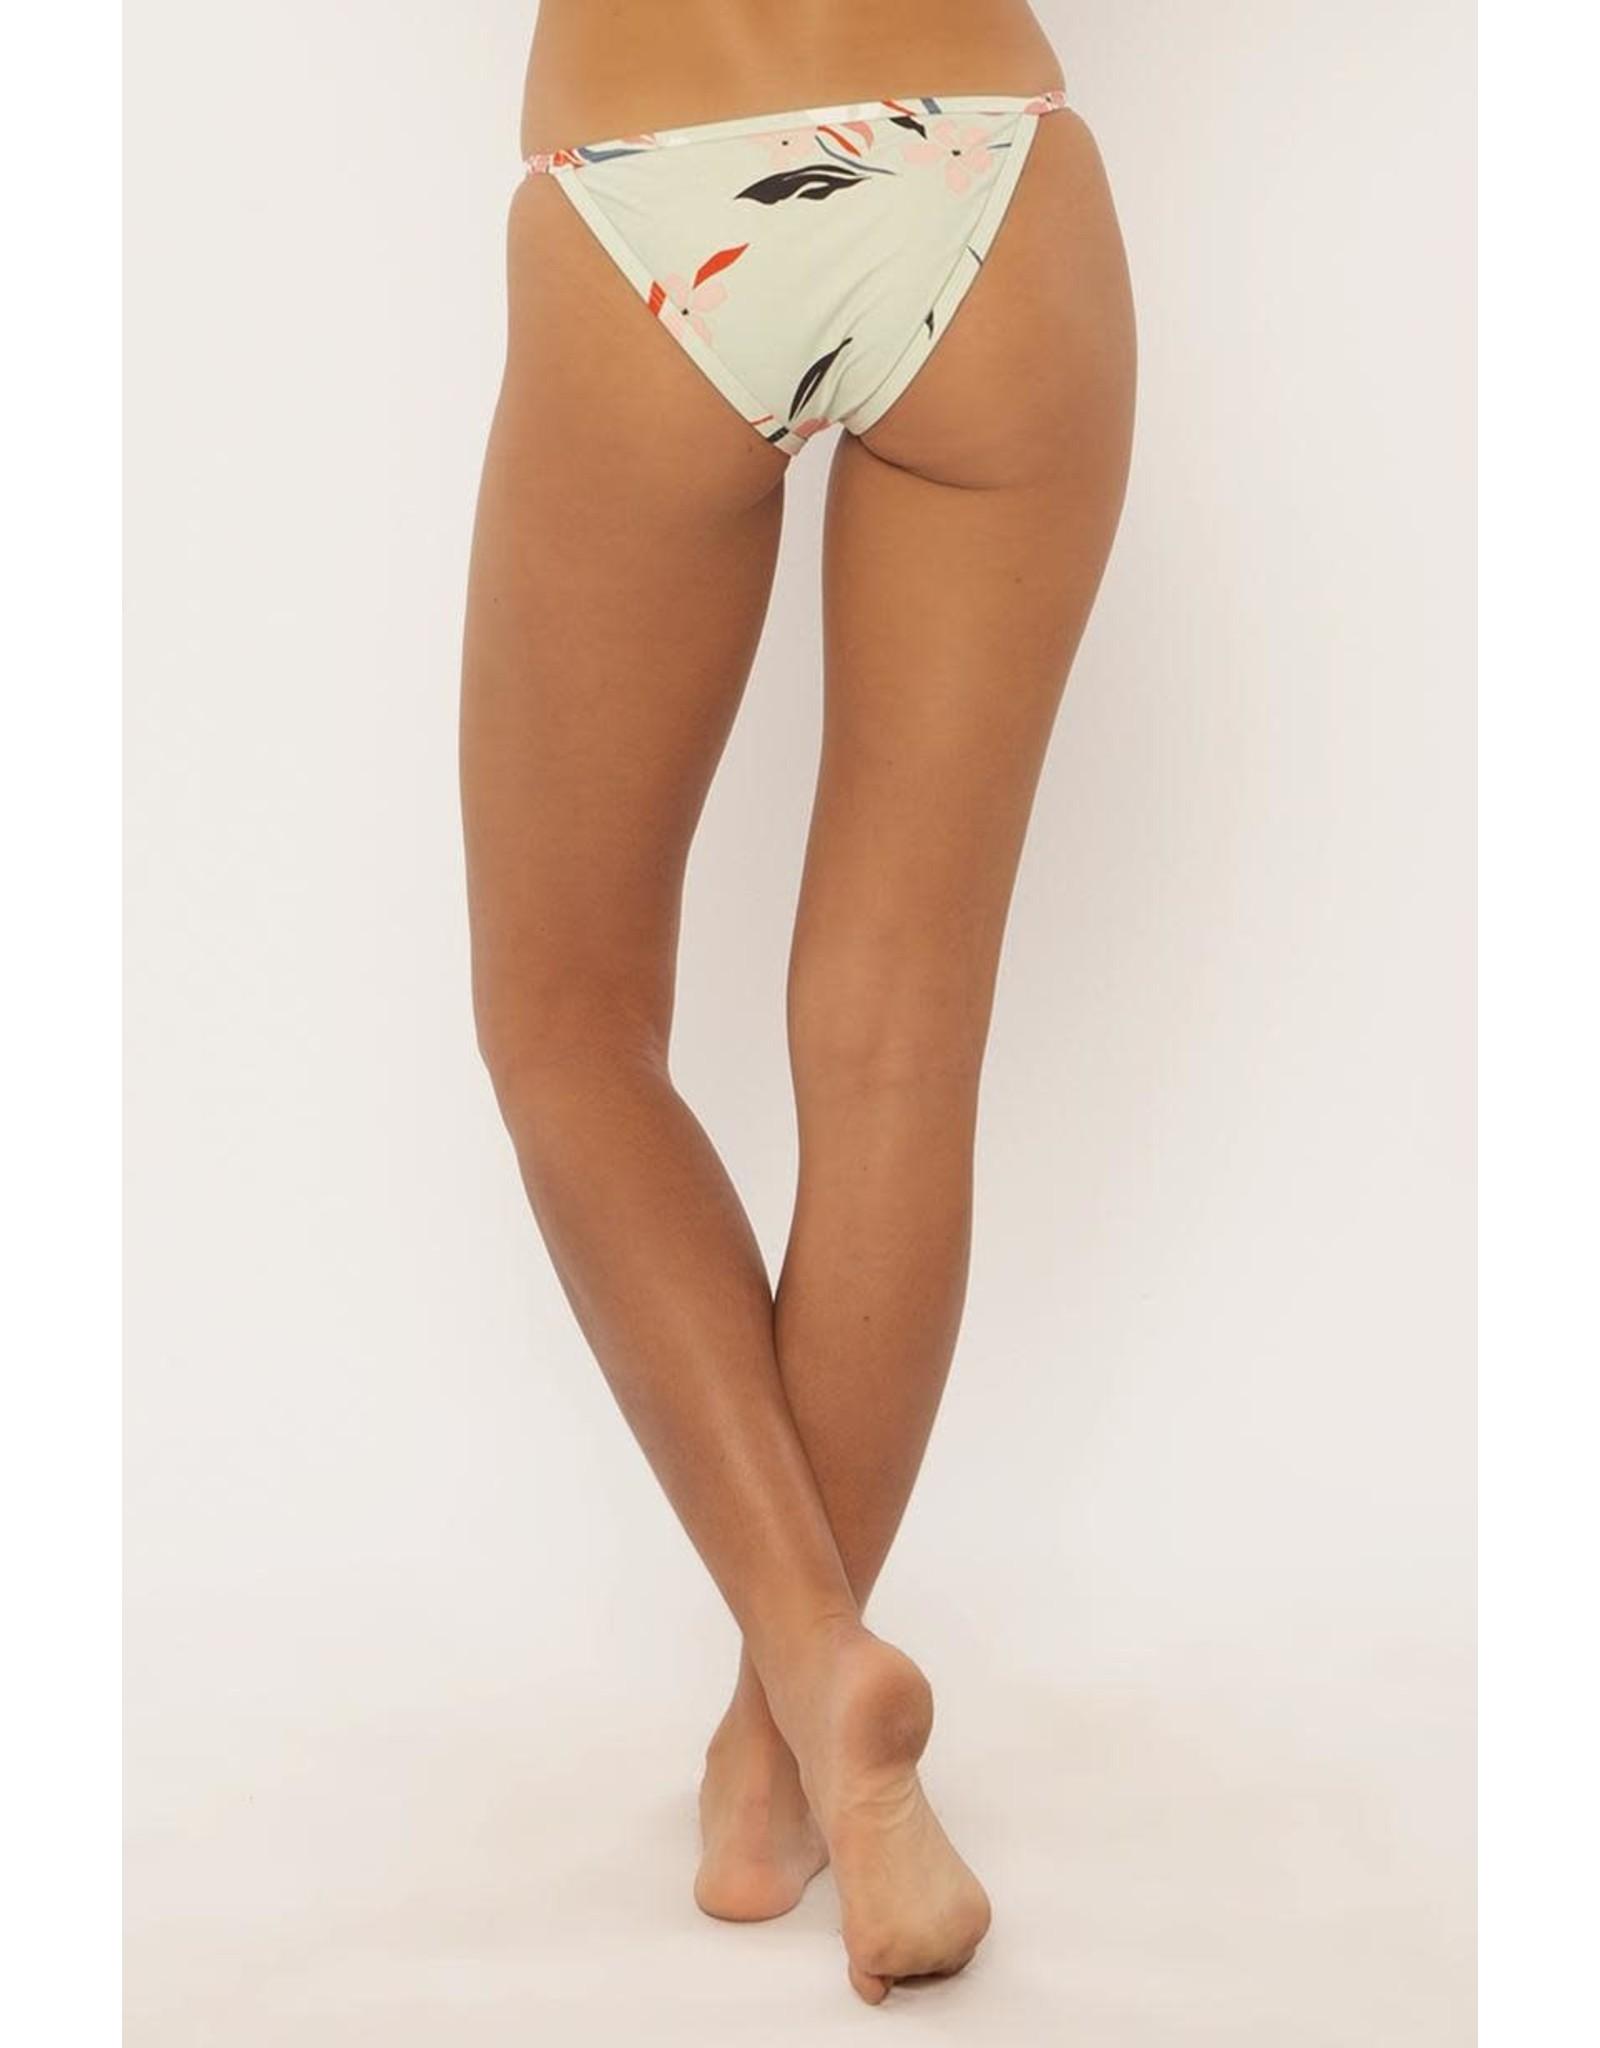 SISSTR Sisstr Cocos Bikini Broek